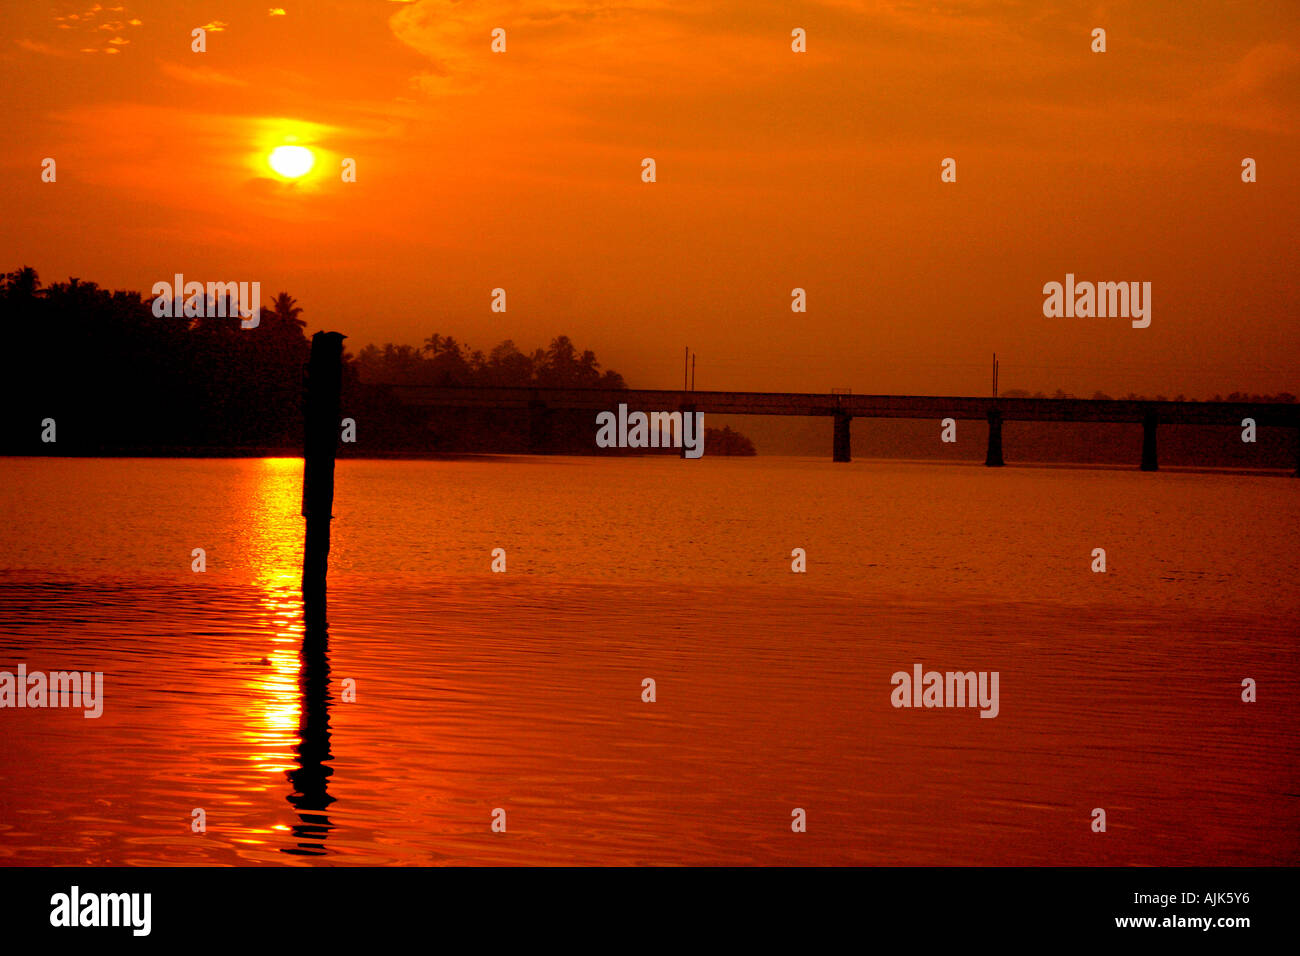 The yellowish glow of the rising sun, a morning view at Aluva, Kerala, India Stock Photo